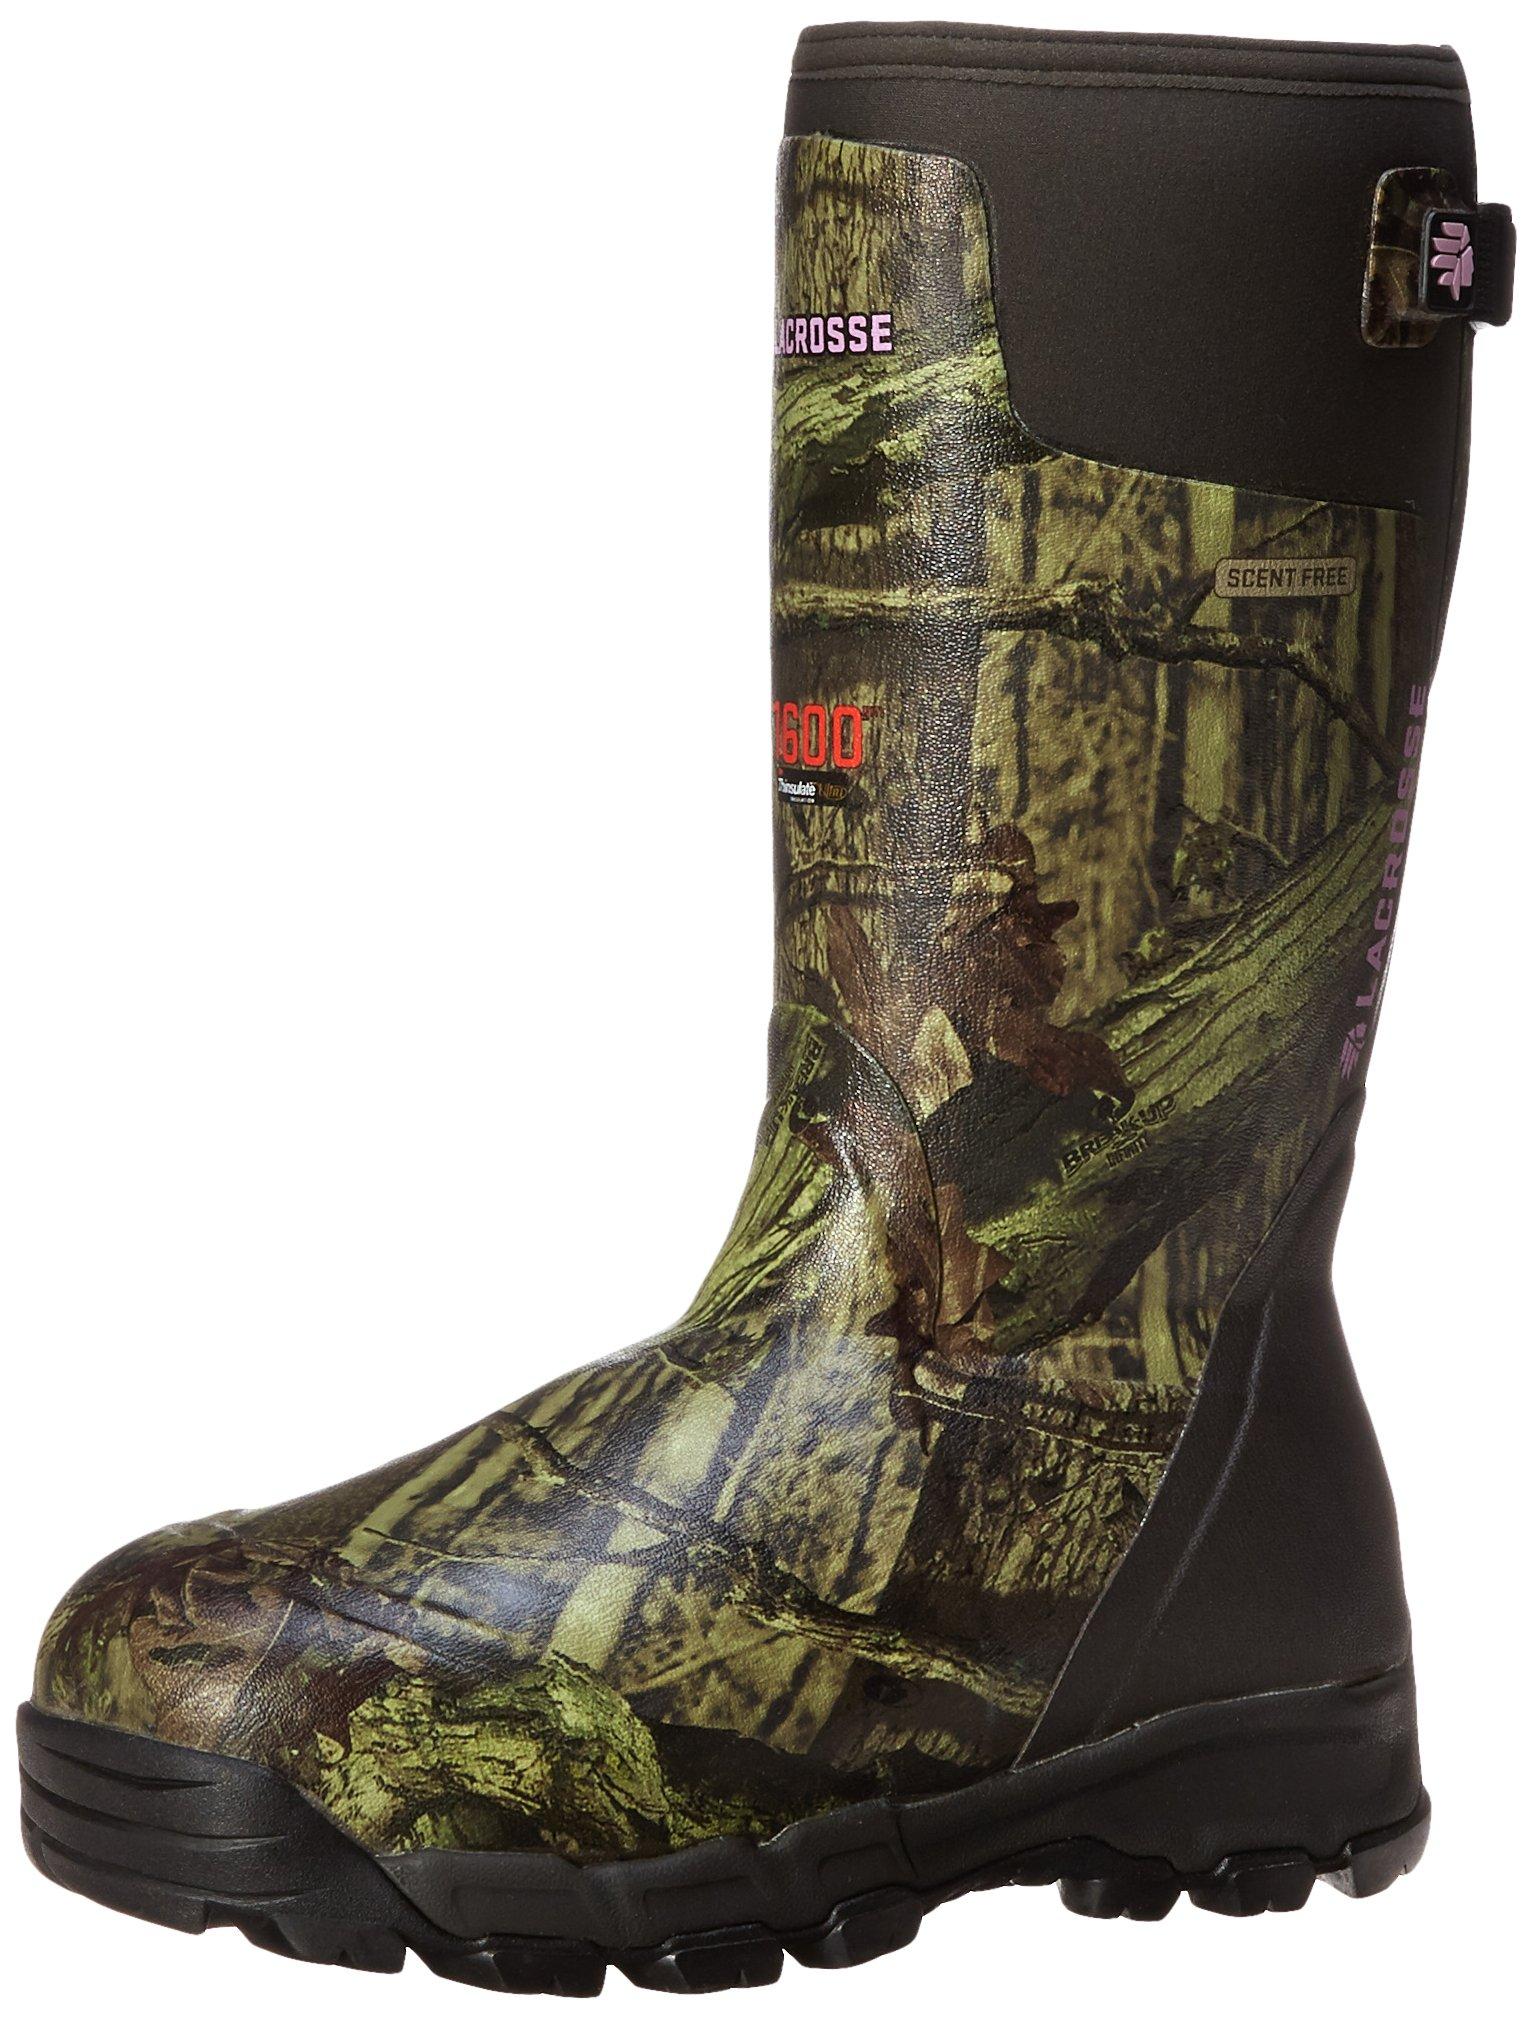 LaCrosse Women's Alphaburly Pro 15 Mo 1600G Hunting Boot,Mossy Oak Break-Up Infinity,5 M US